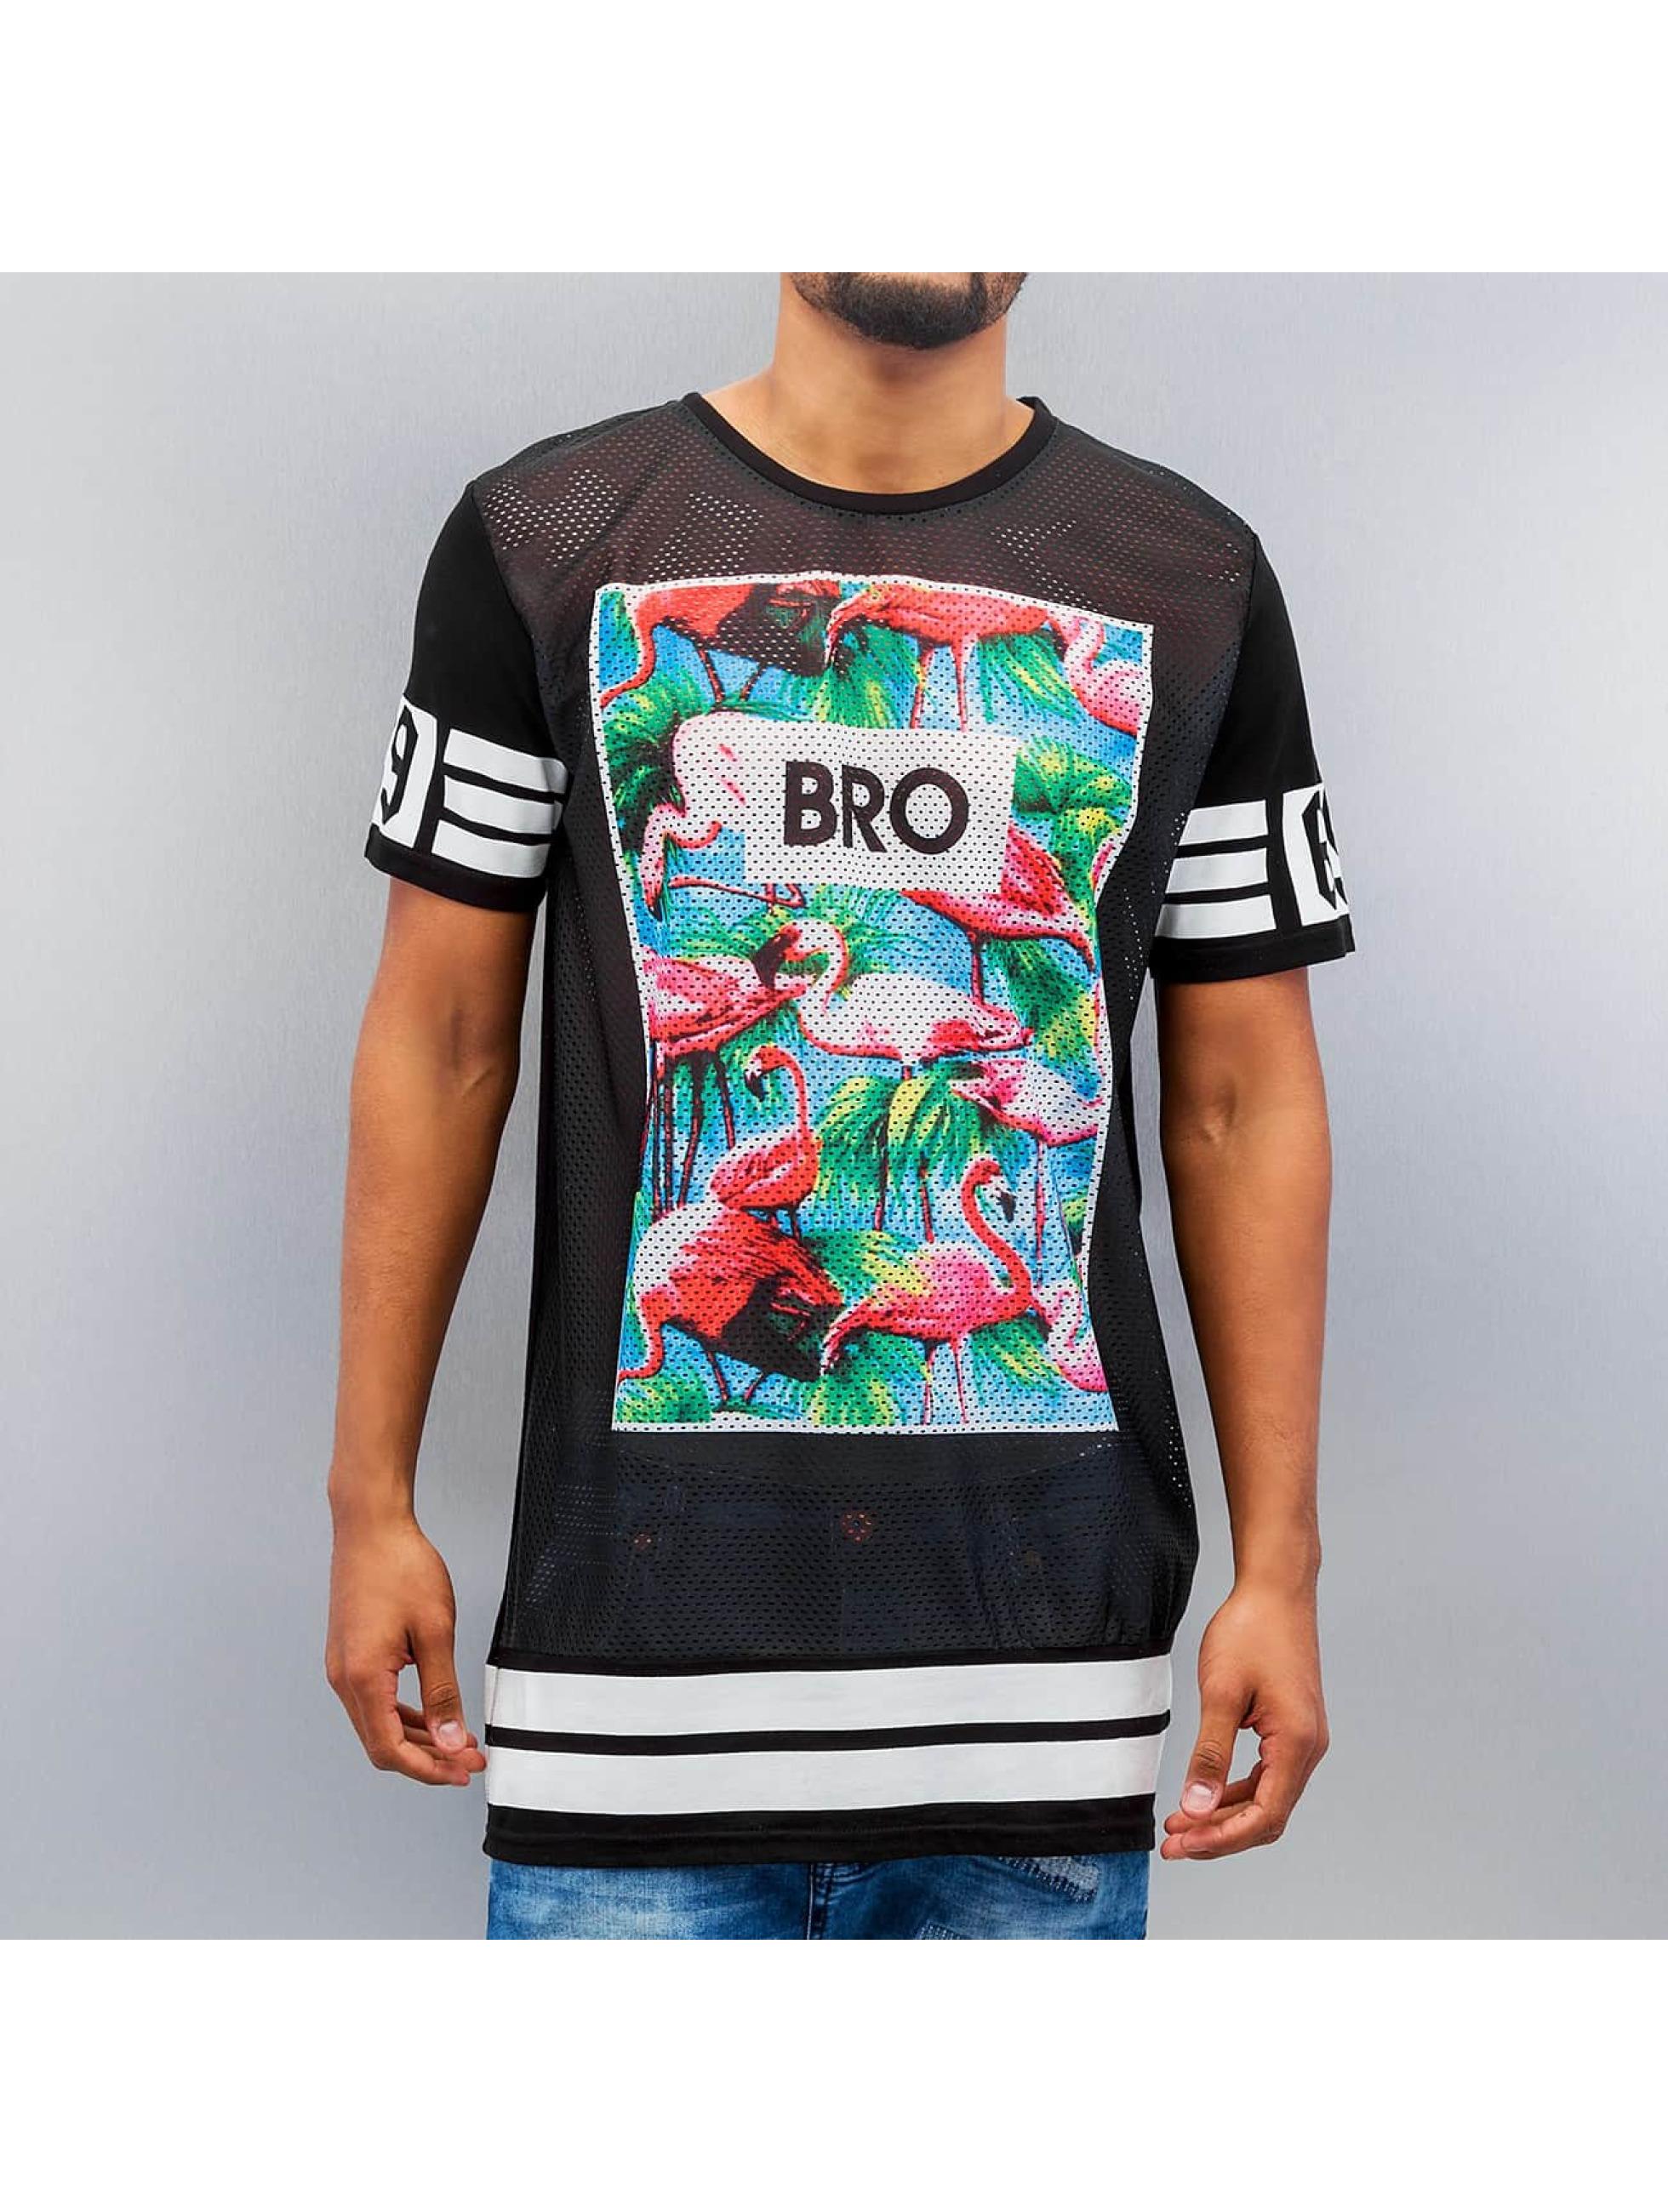 VSCT Clubwear T-Shirt Flamingo Bro Oversize schwarz